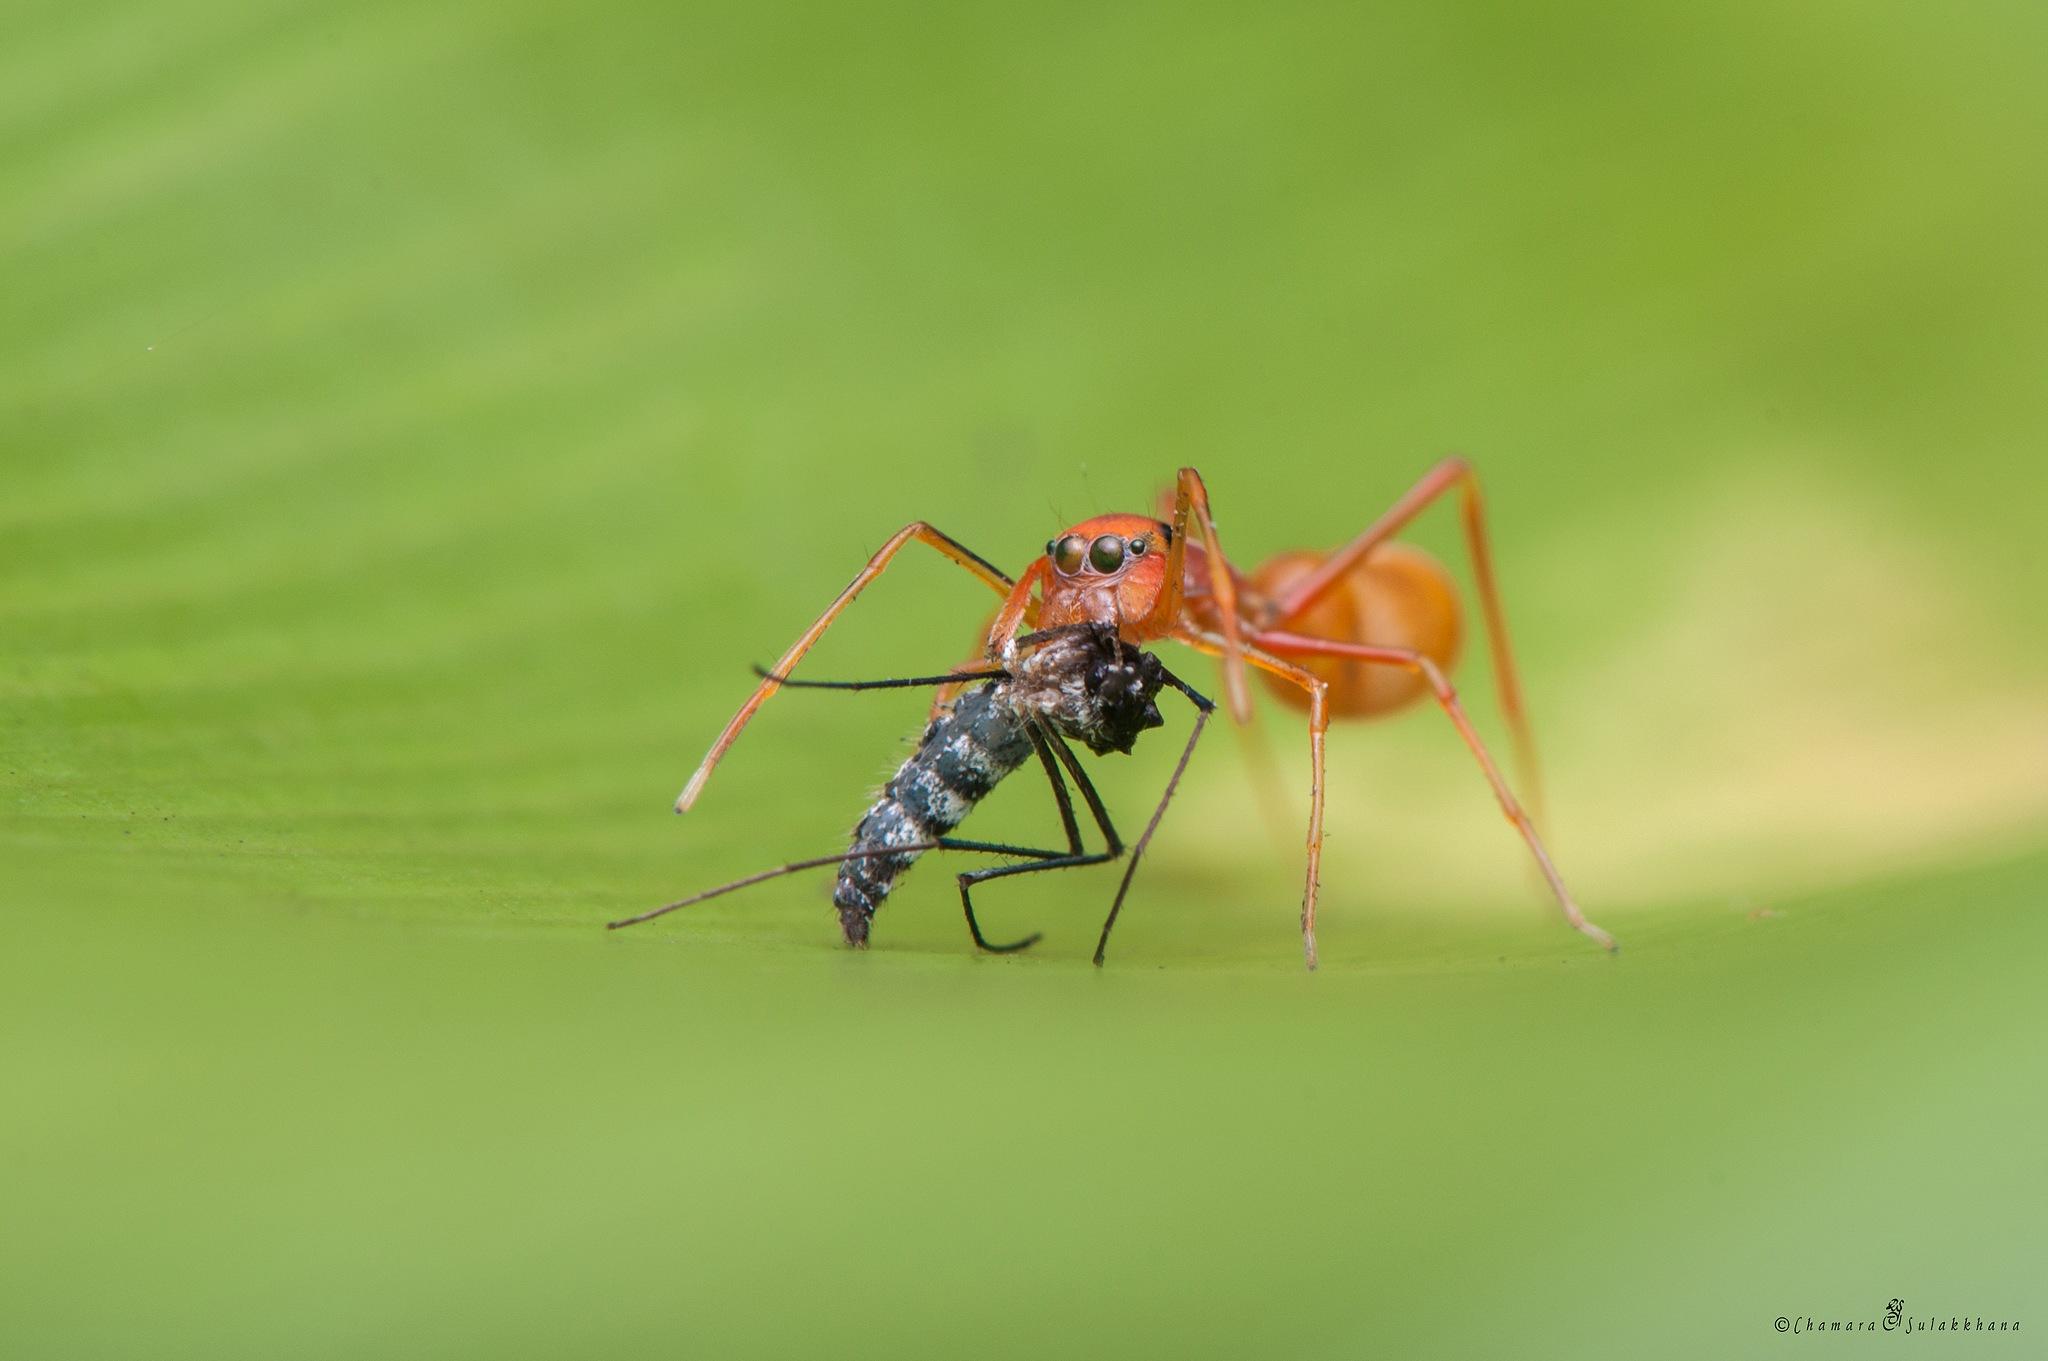 Mosquito Killer by Sulakkhana Chamara